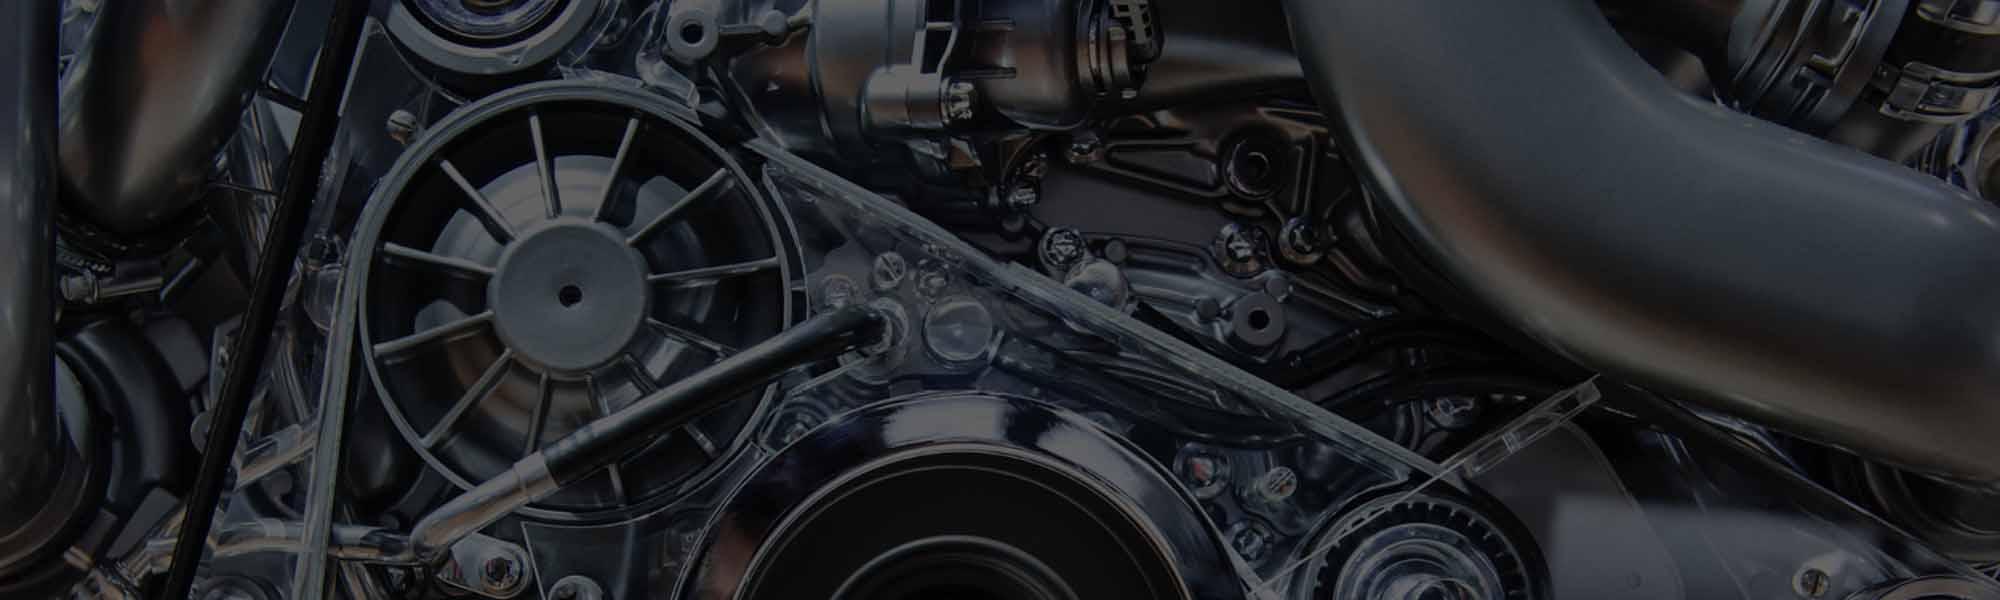 Find car parts now